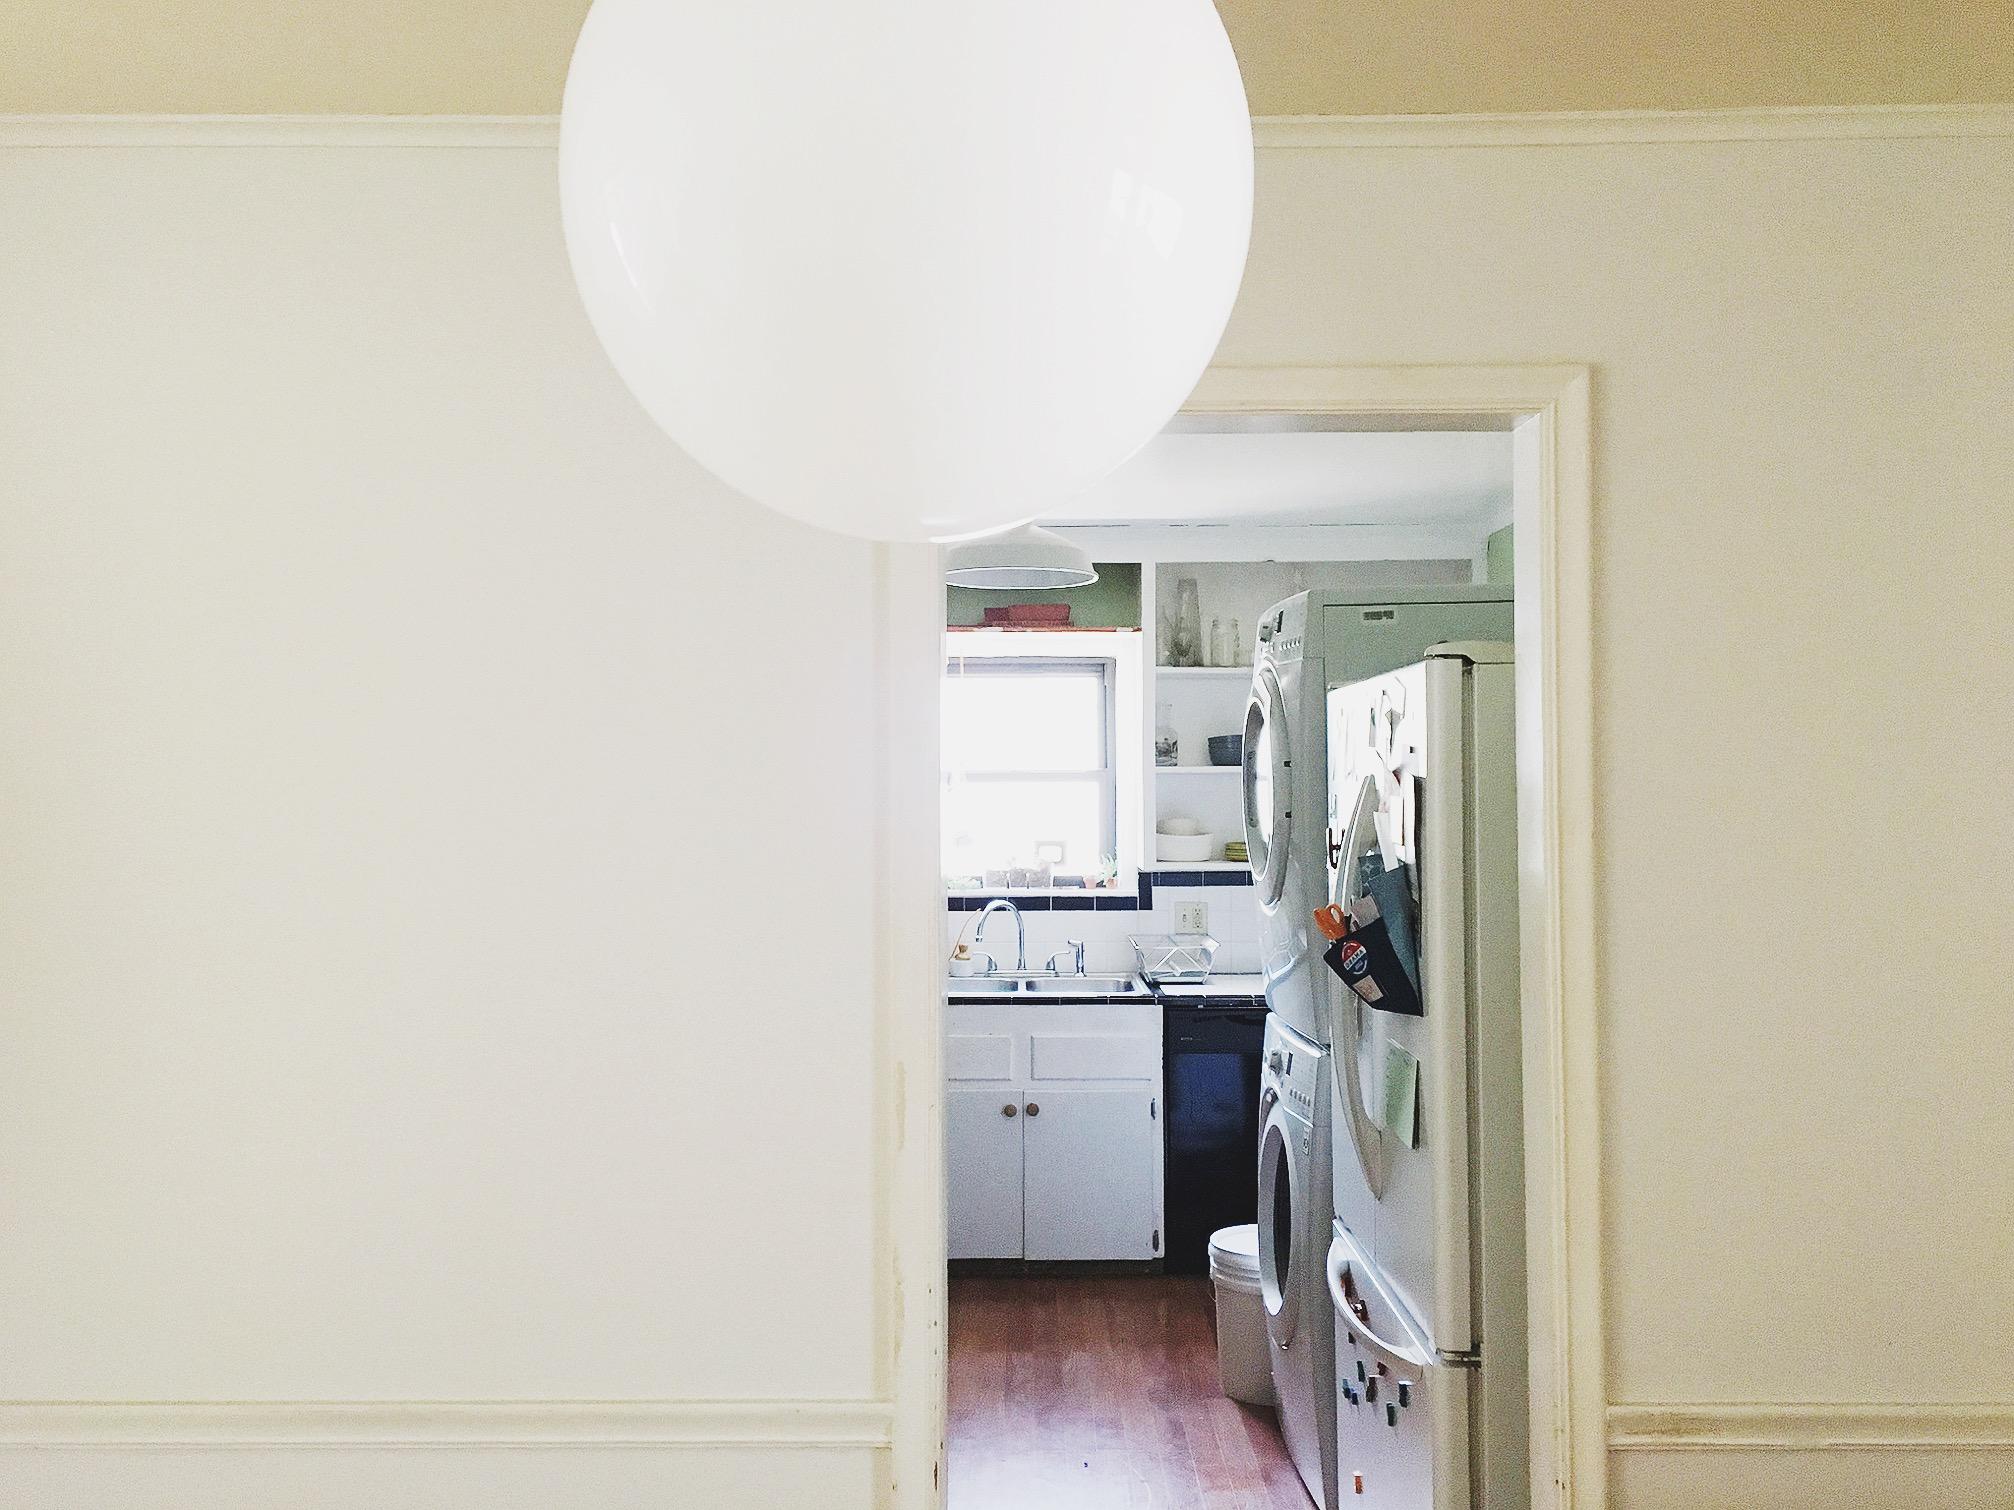 Bungalow kitchen Tulsa interior design